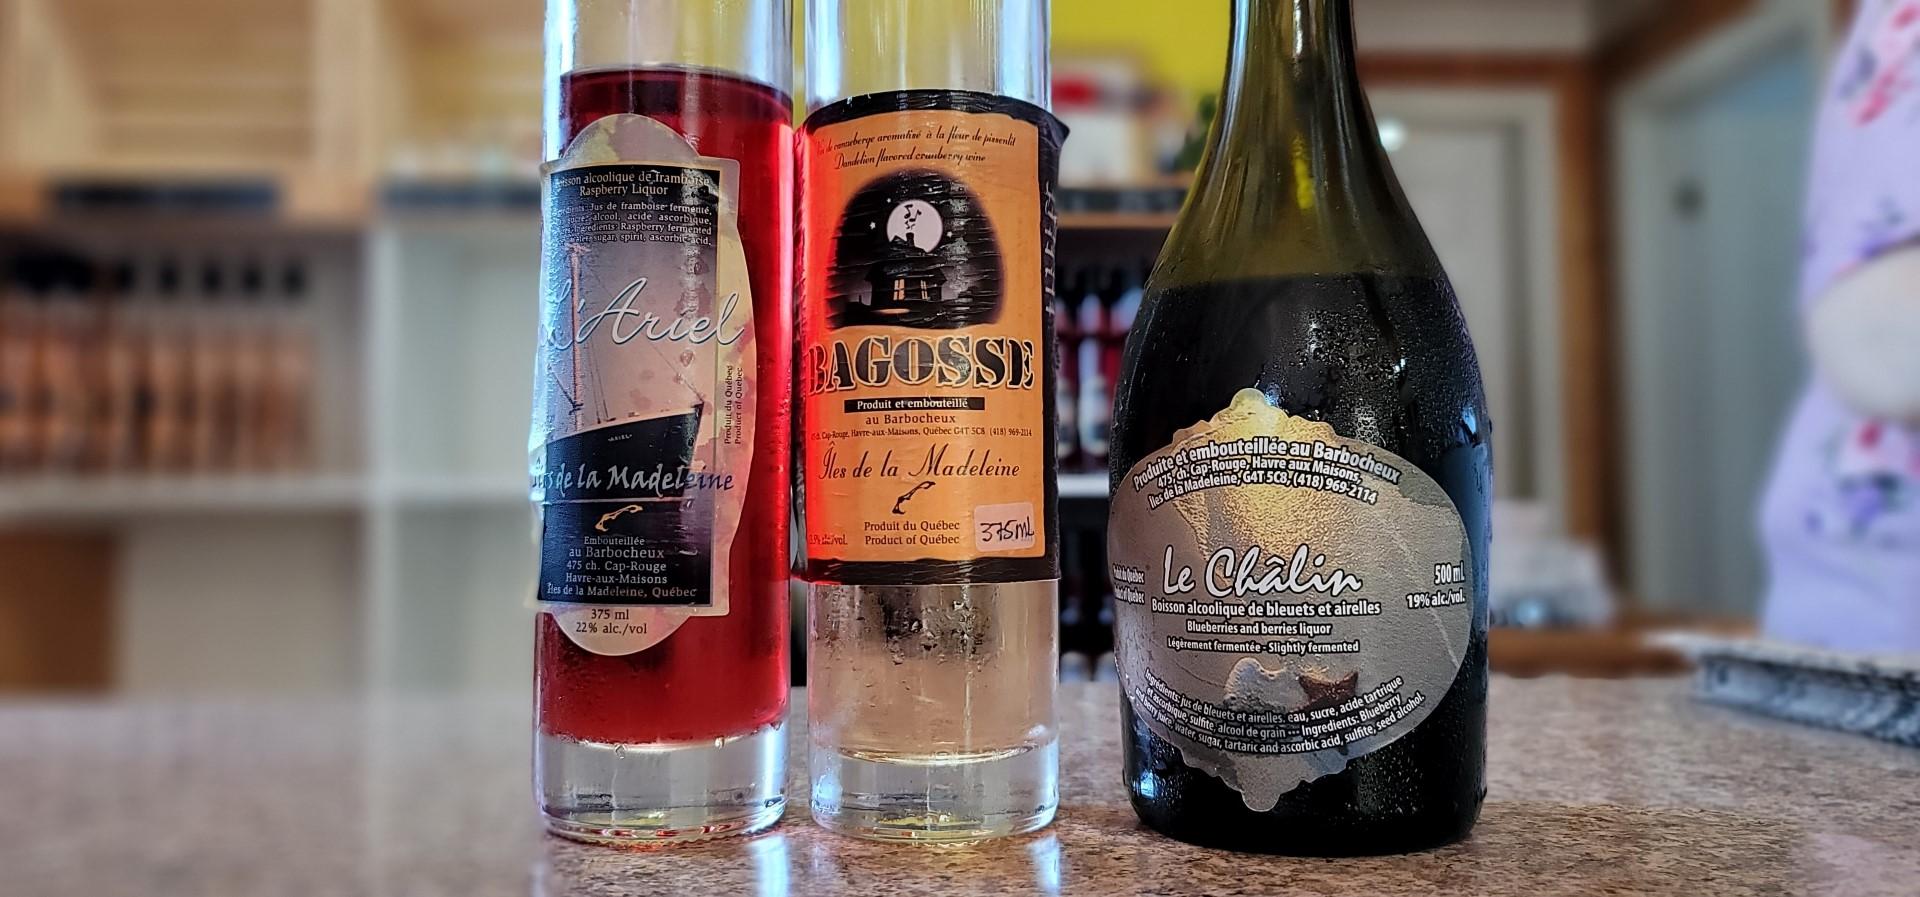 wines at Le Barbocheux